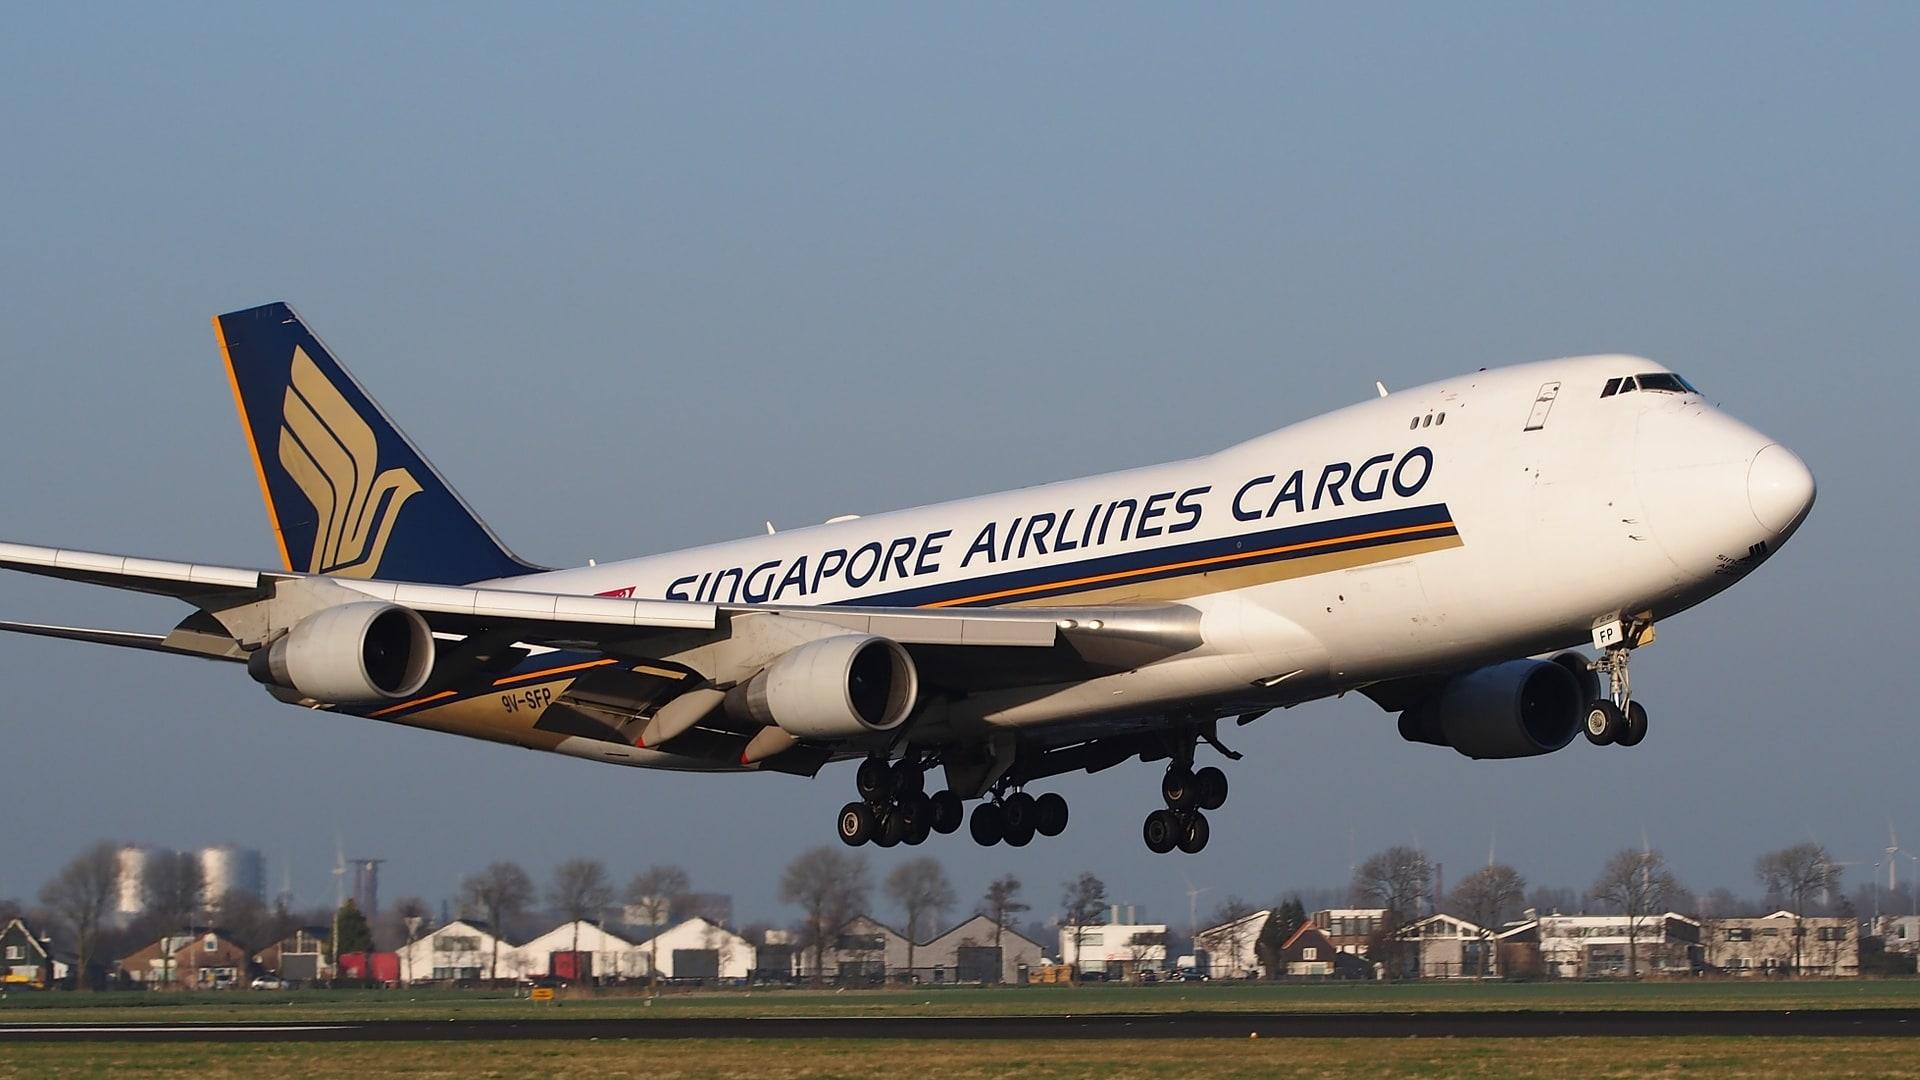 Boeing 747-412F